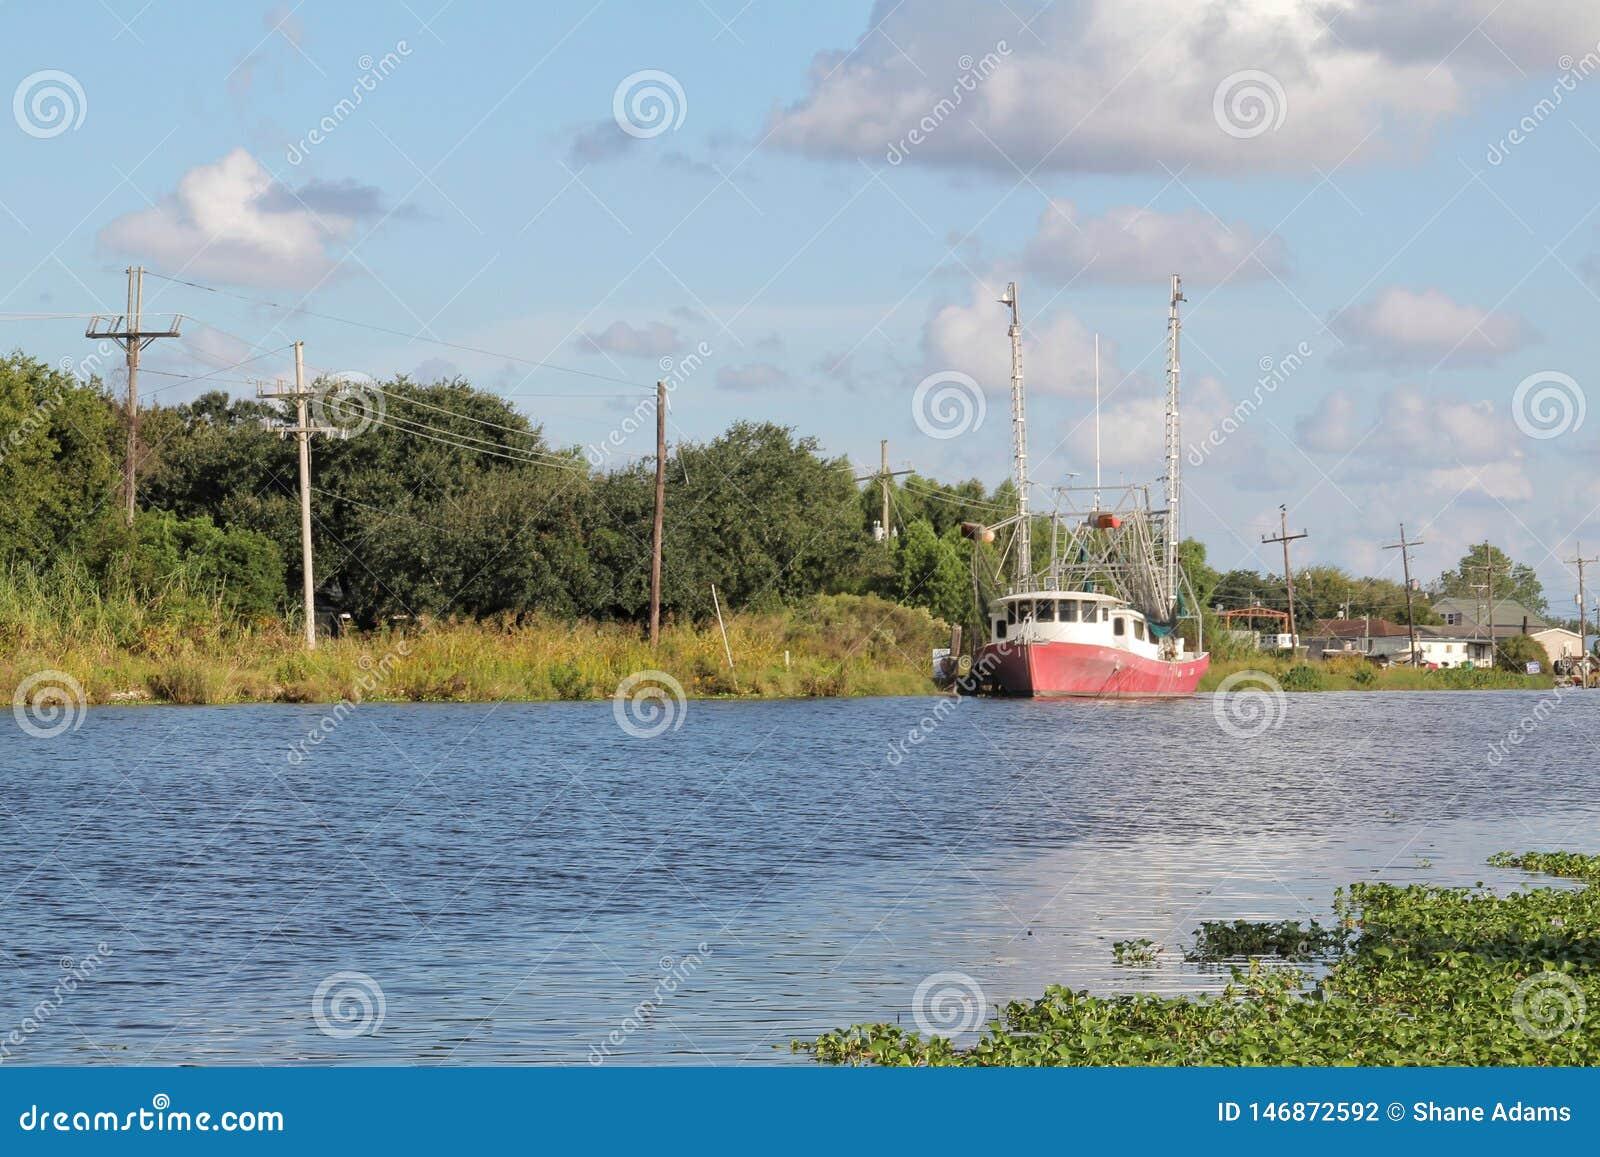 Bayou Lafourche, Louisiana